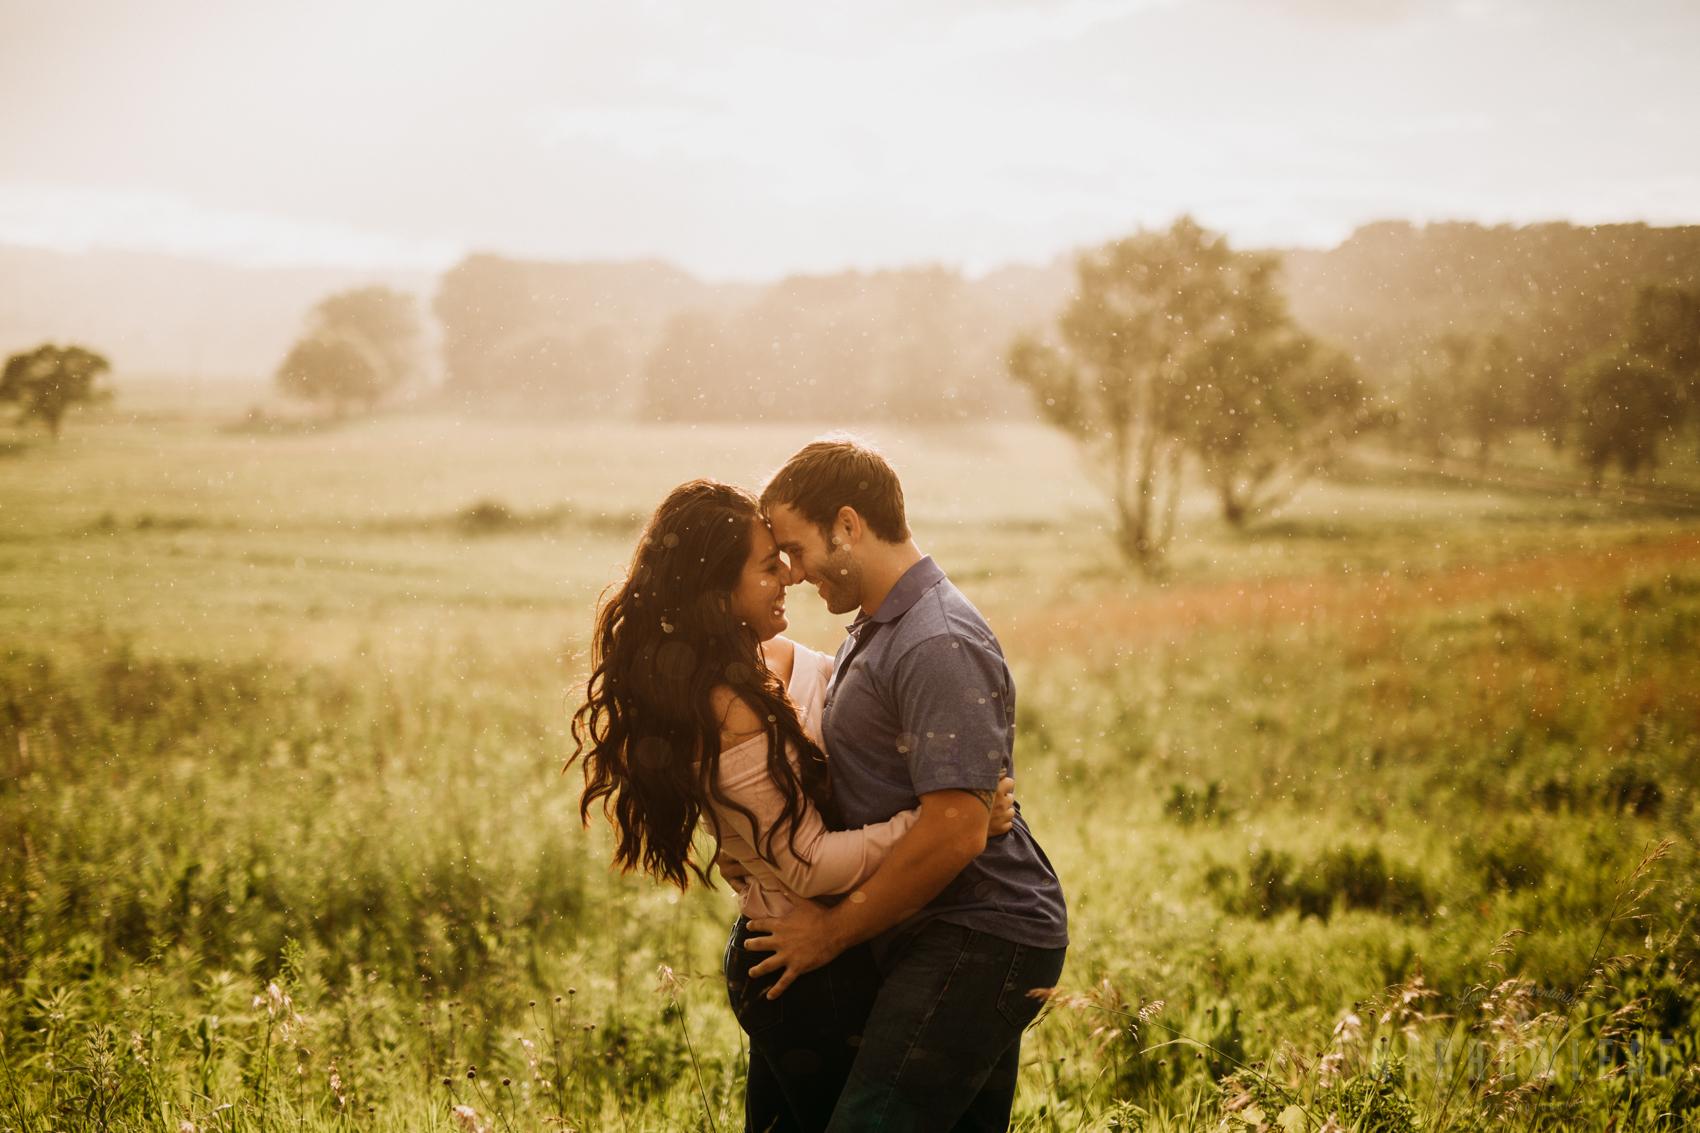 summer-engagement-photos-frontenac-mn-NarrowLeaf_Love_&_Adventure_Photography-20.jpg